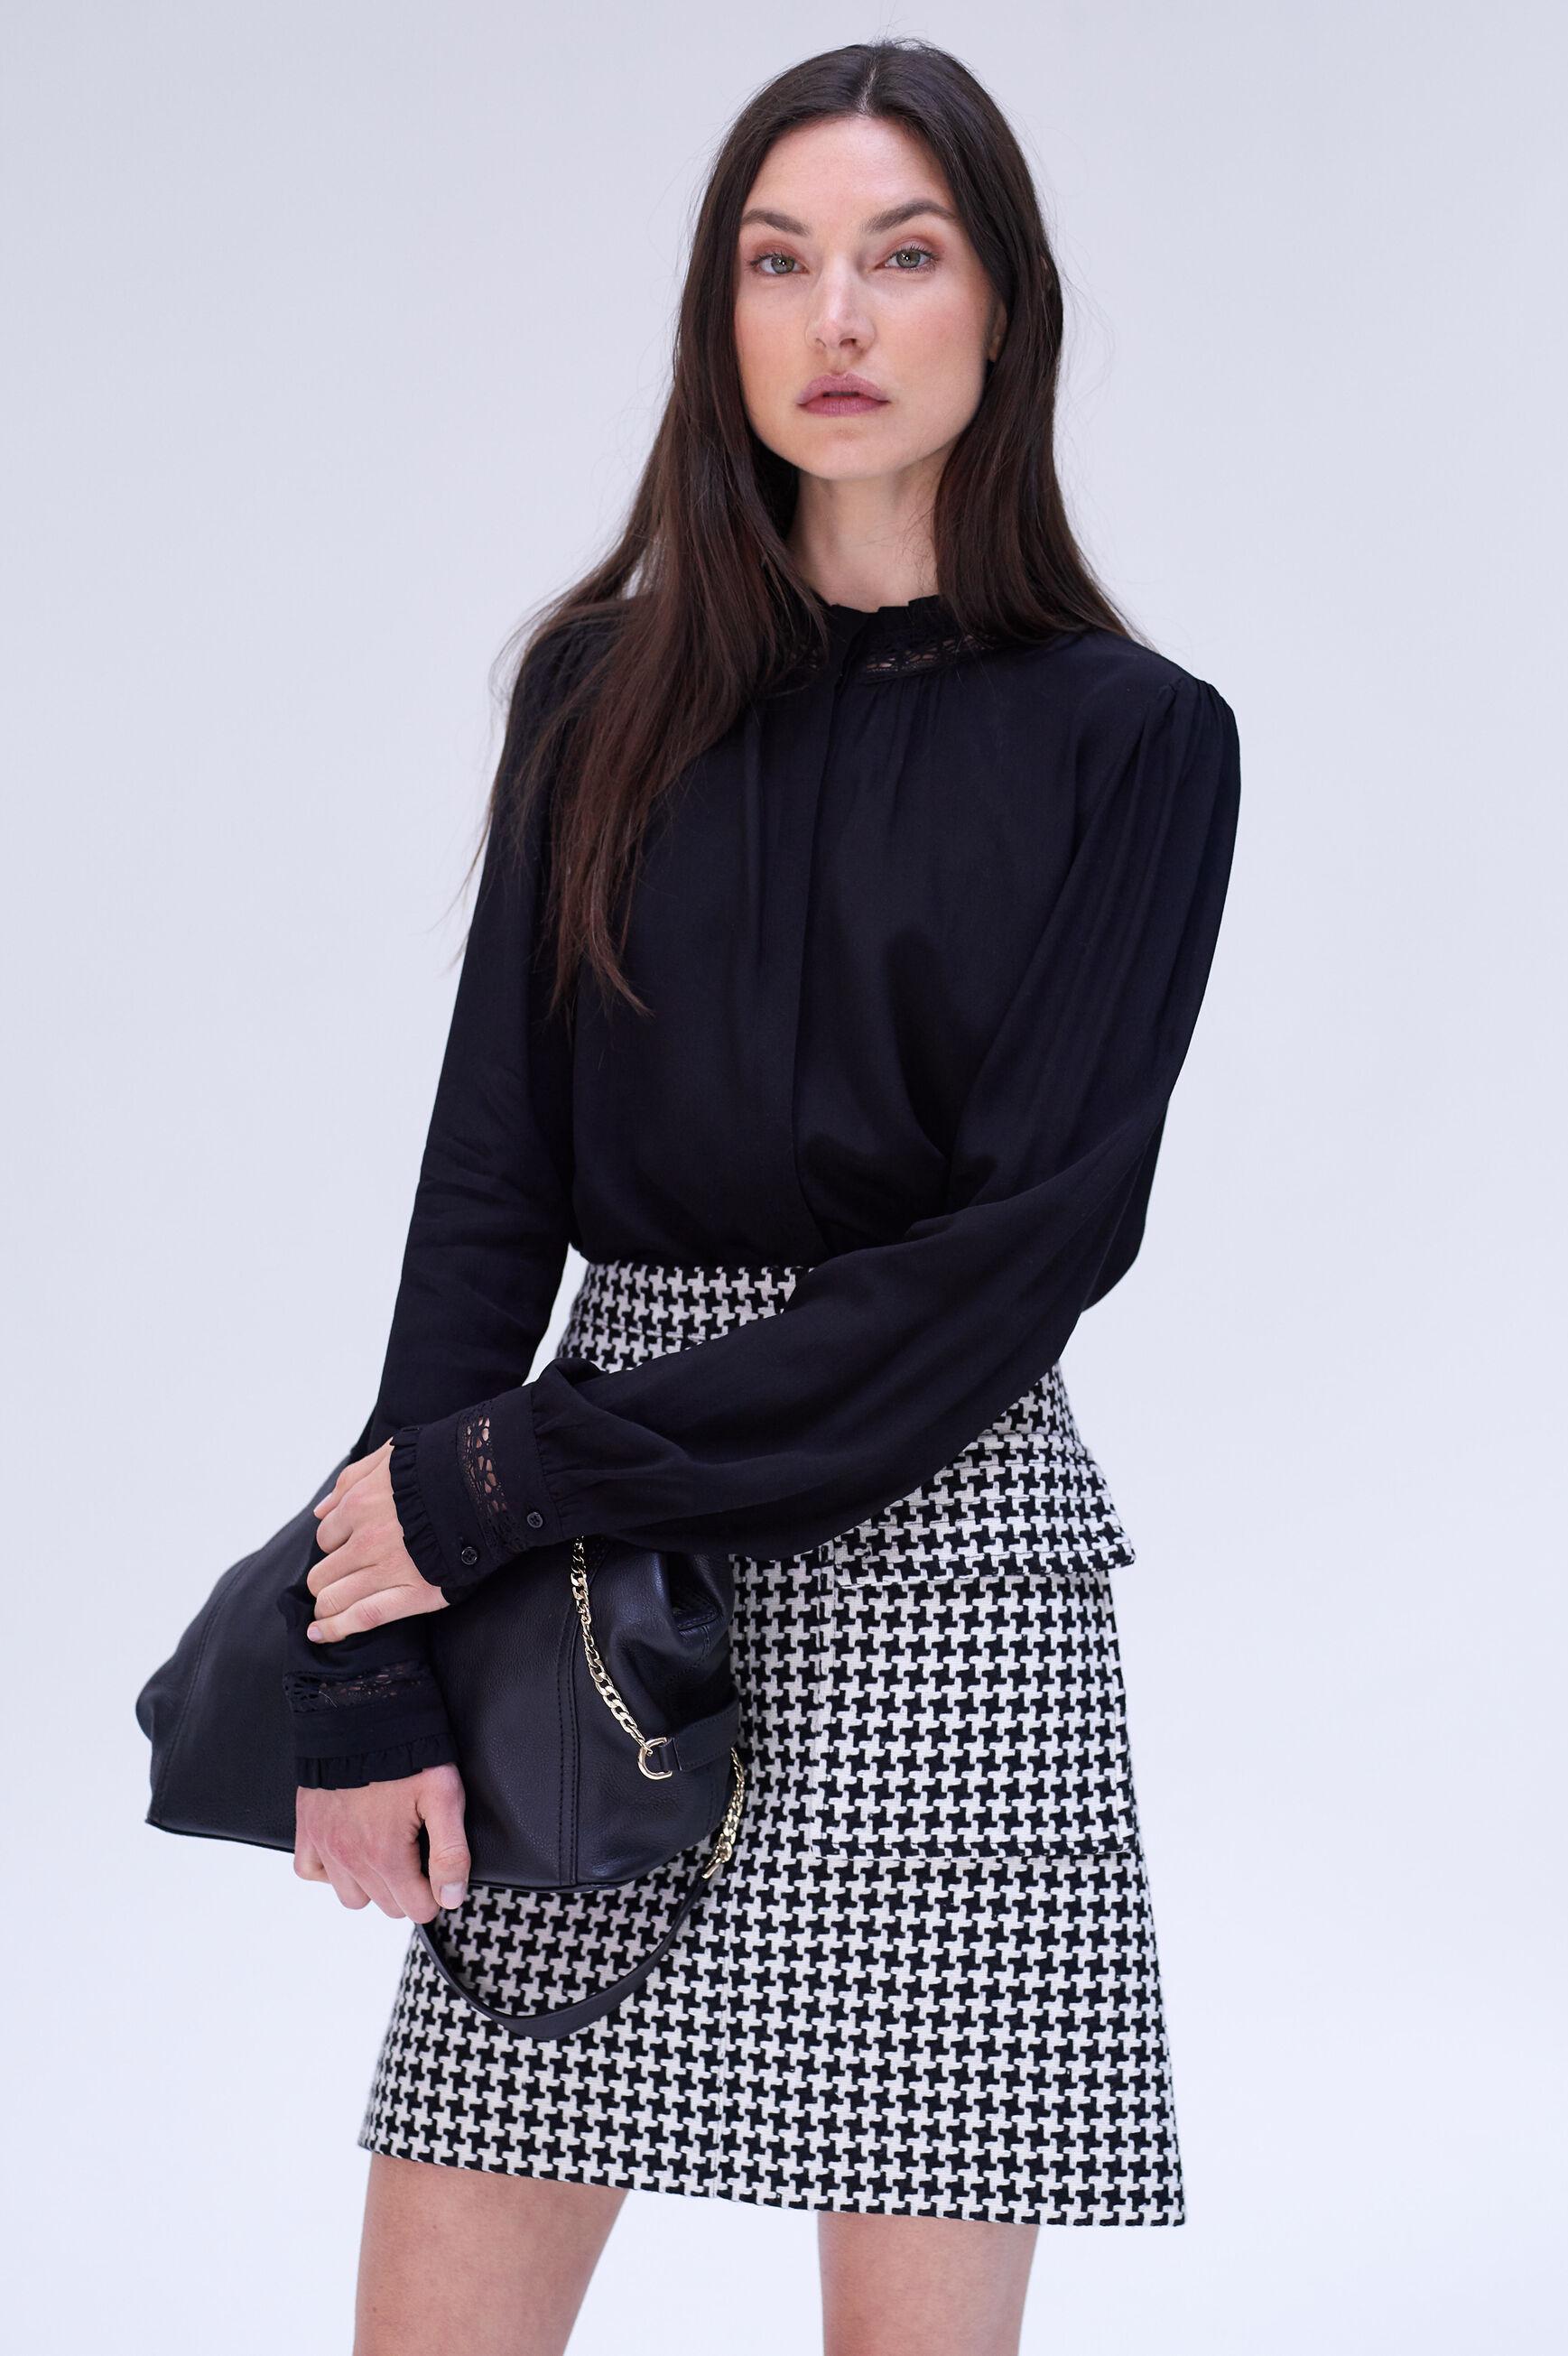 catalogue mode femme 50 ans